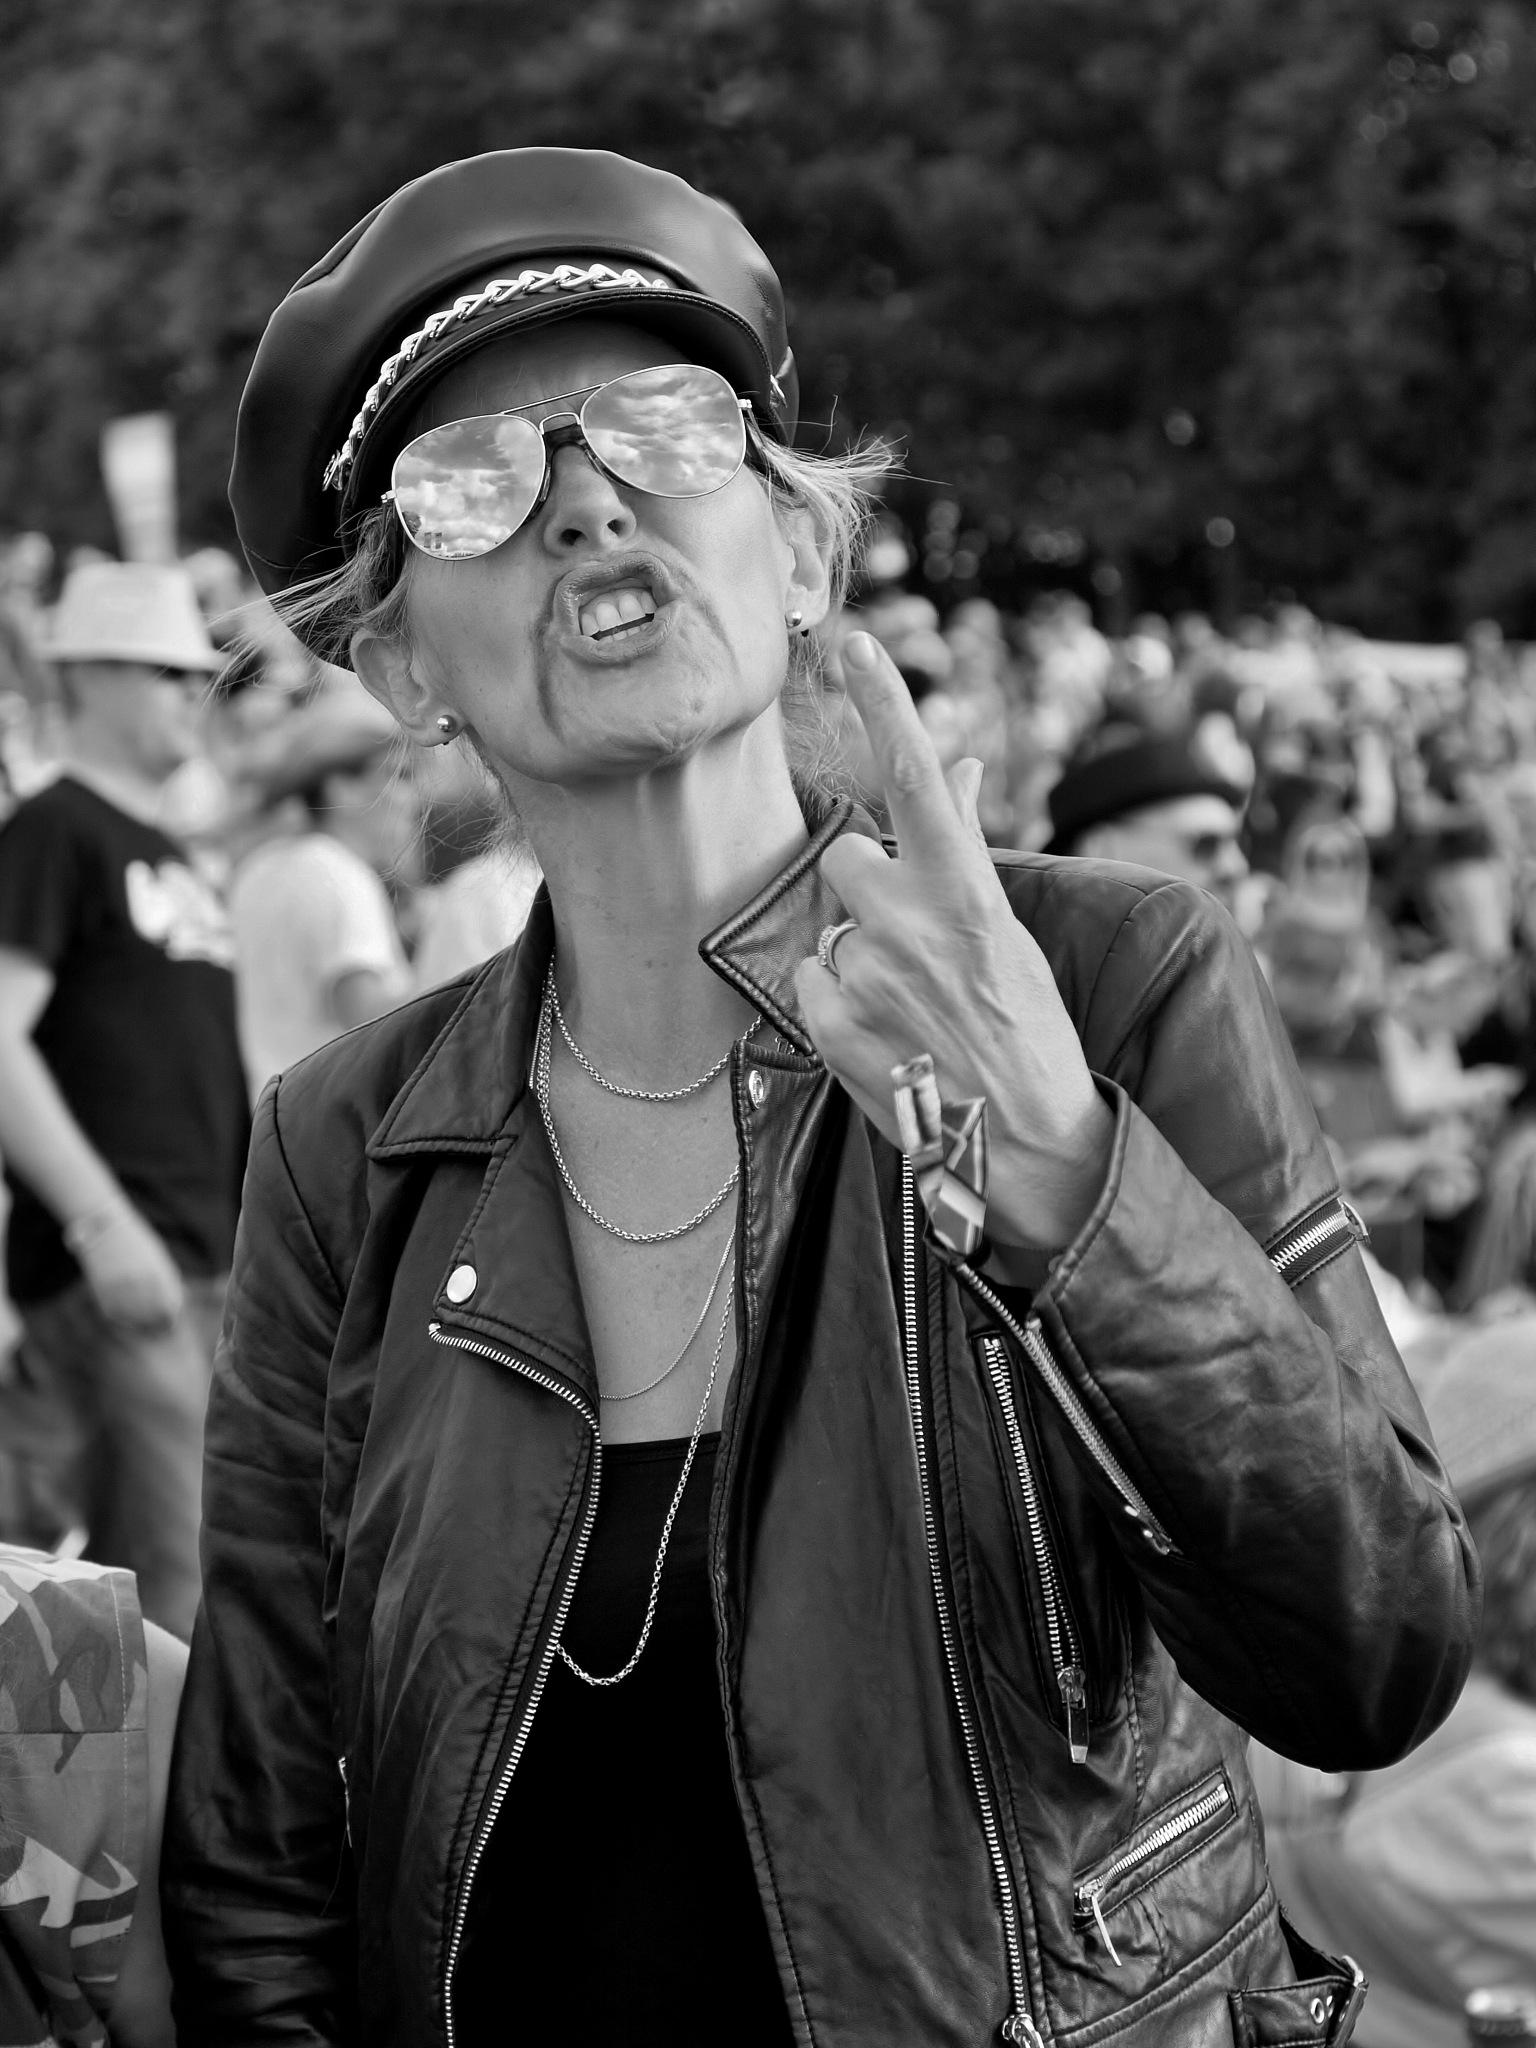 Woman In Leather Costume - REWIND Music Festival 2017 - Monochrome by paul.hosker